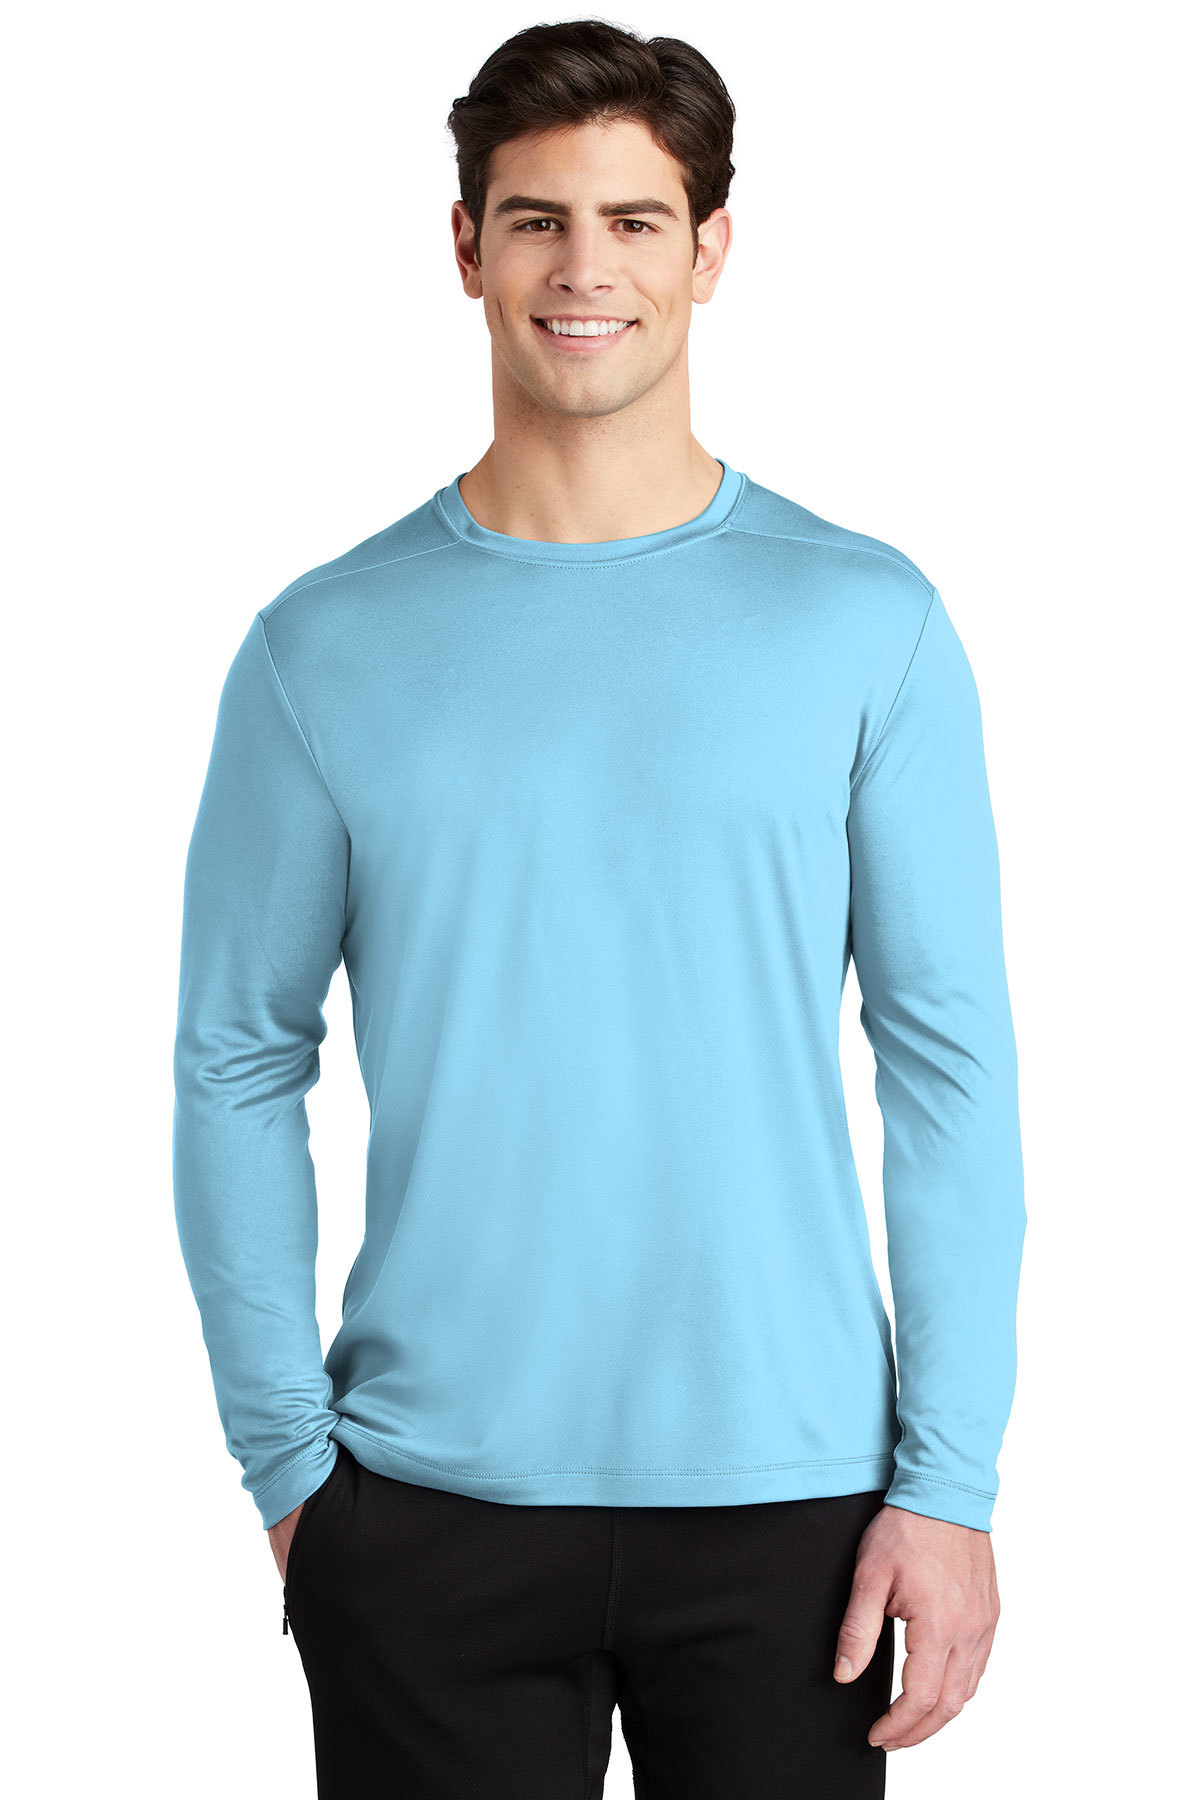 Sport Tek Posi Uv Pro Long Sleeve Tee Long Sleeve T Shirts Sport Tek Skip to main search results. sport tek posi uv pro long sleeve tee long sleeve t shirts sport tek